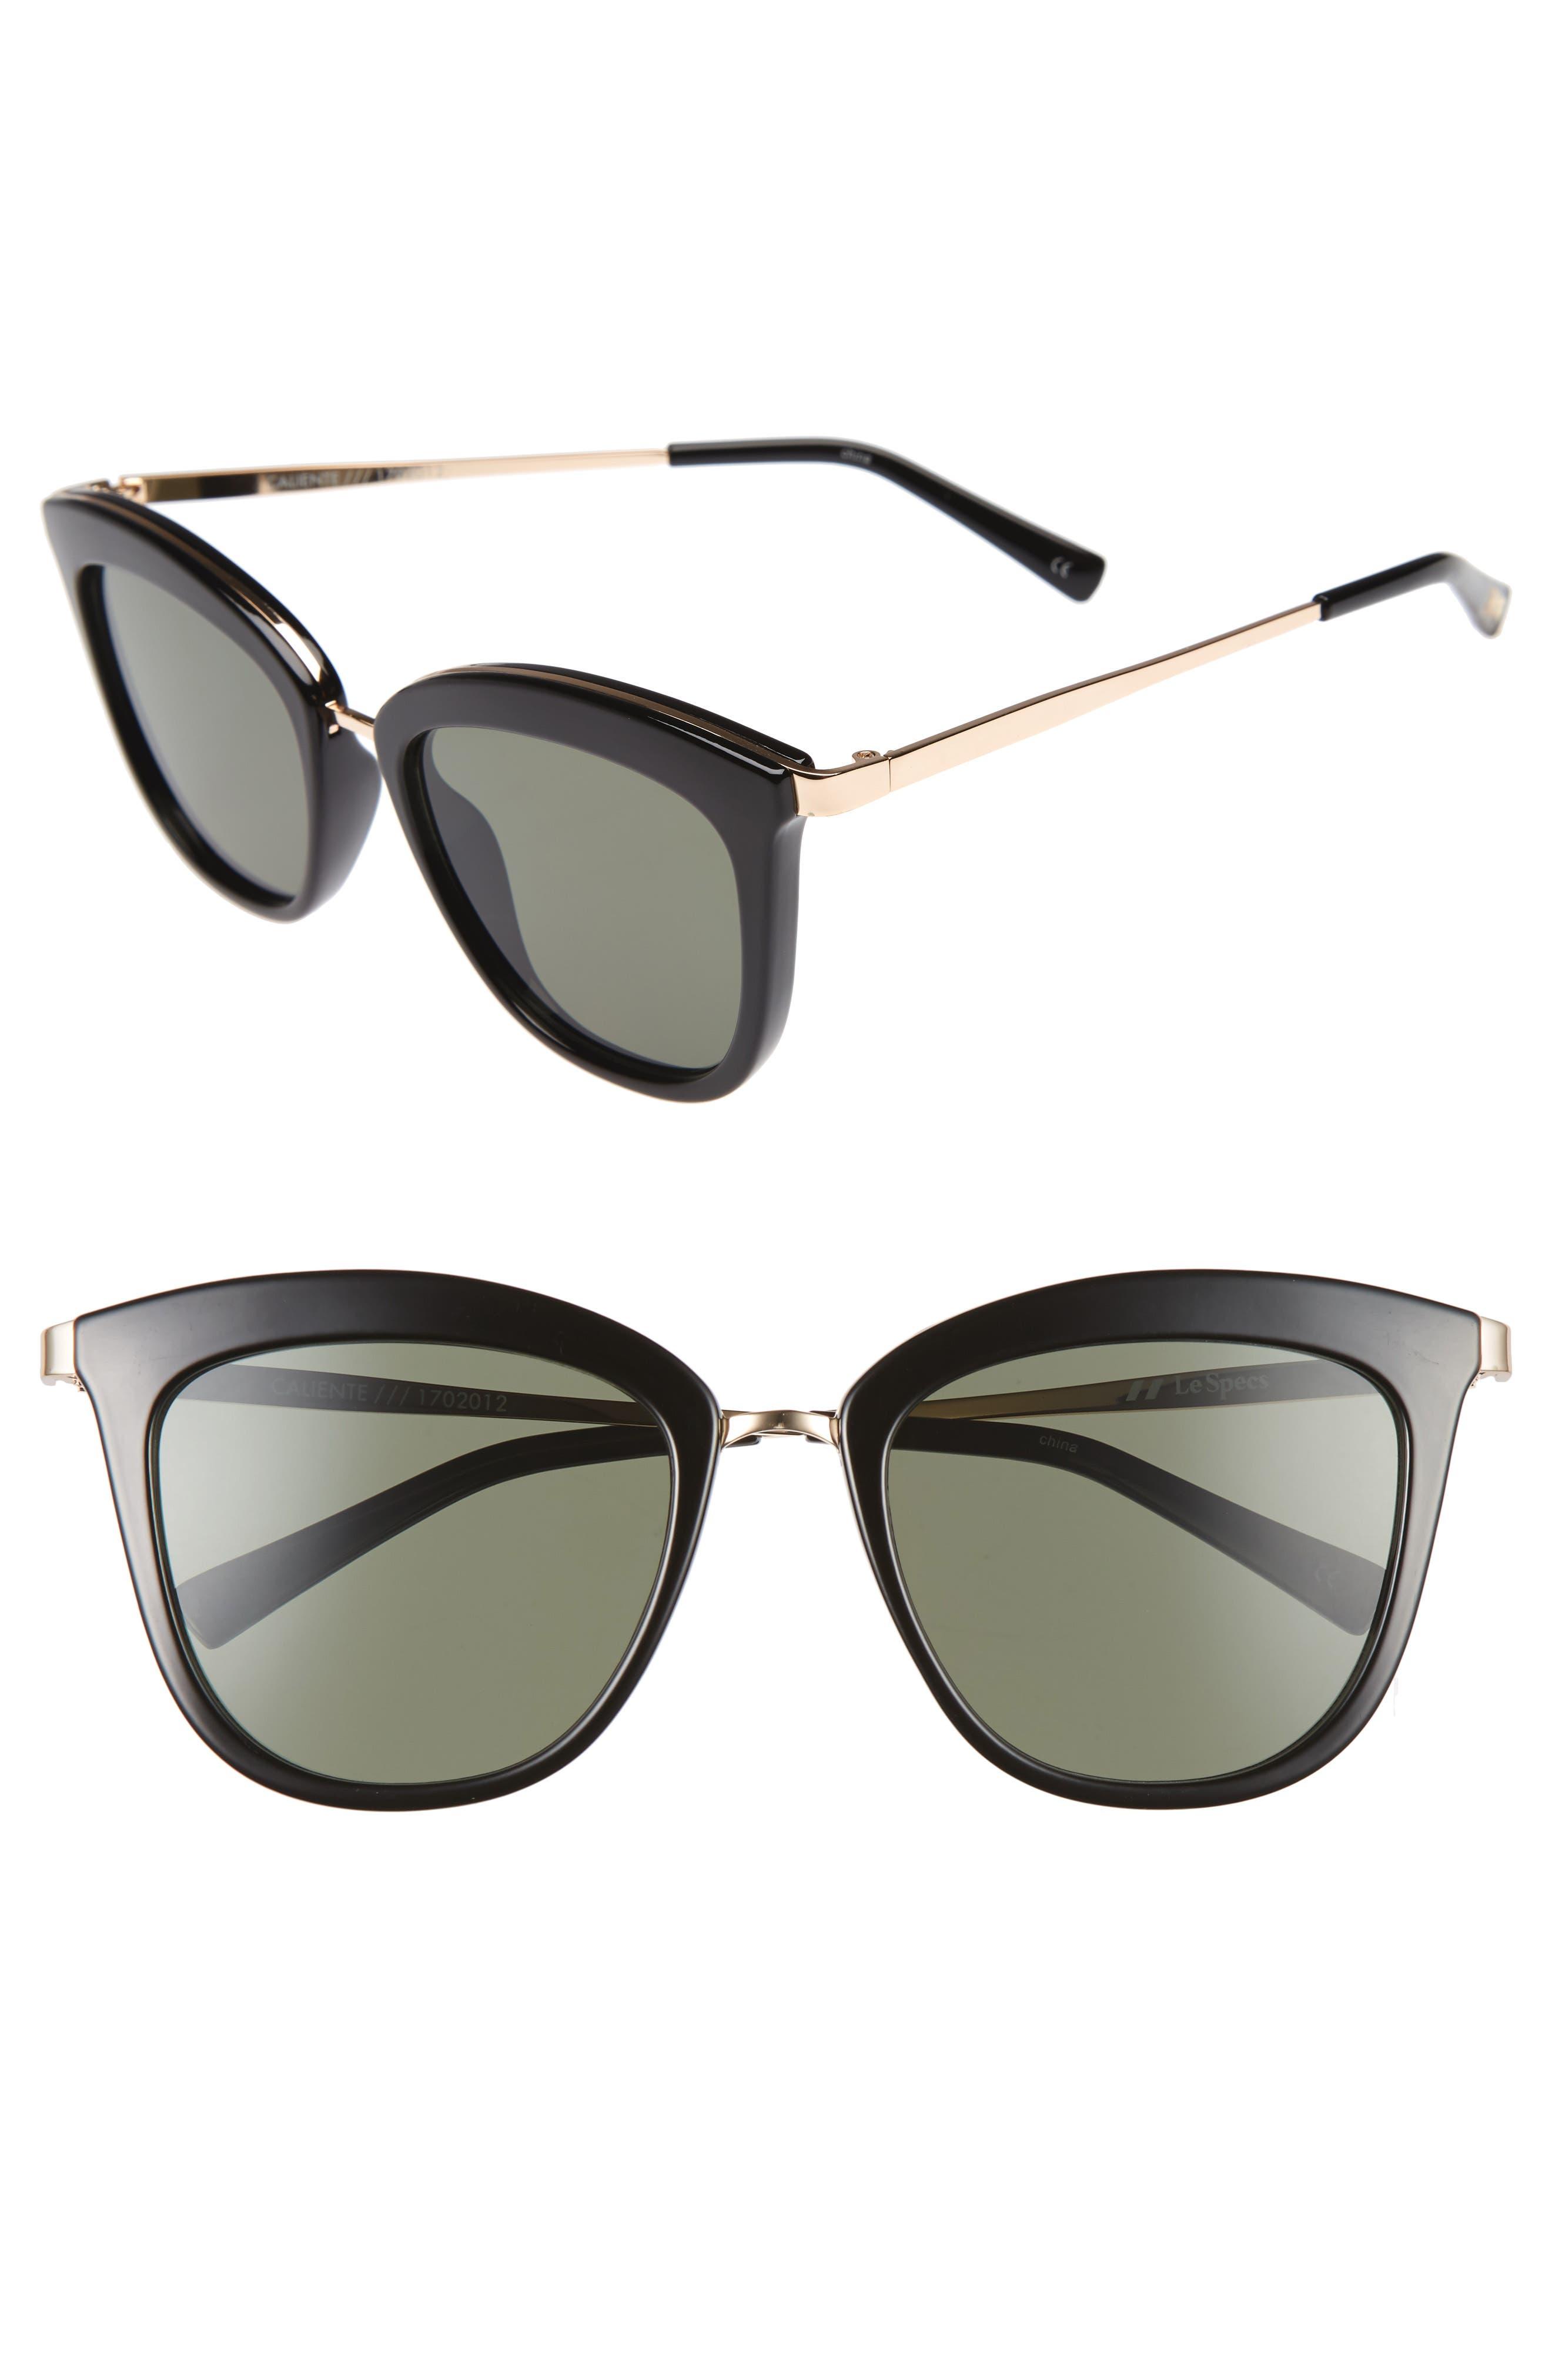 Caliente 53mm Cat Eye Sunglasses